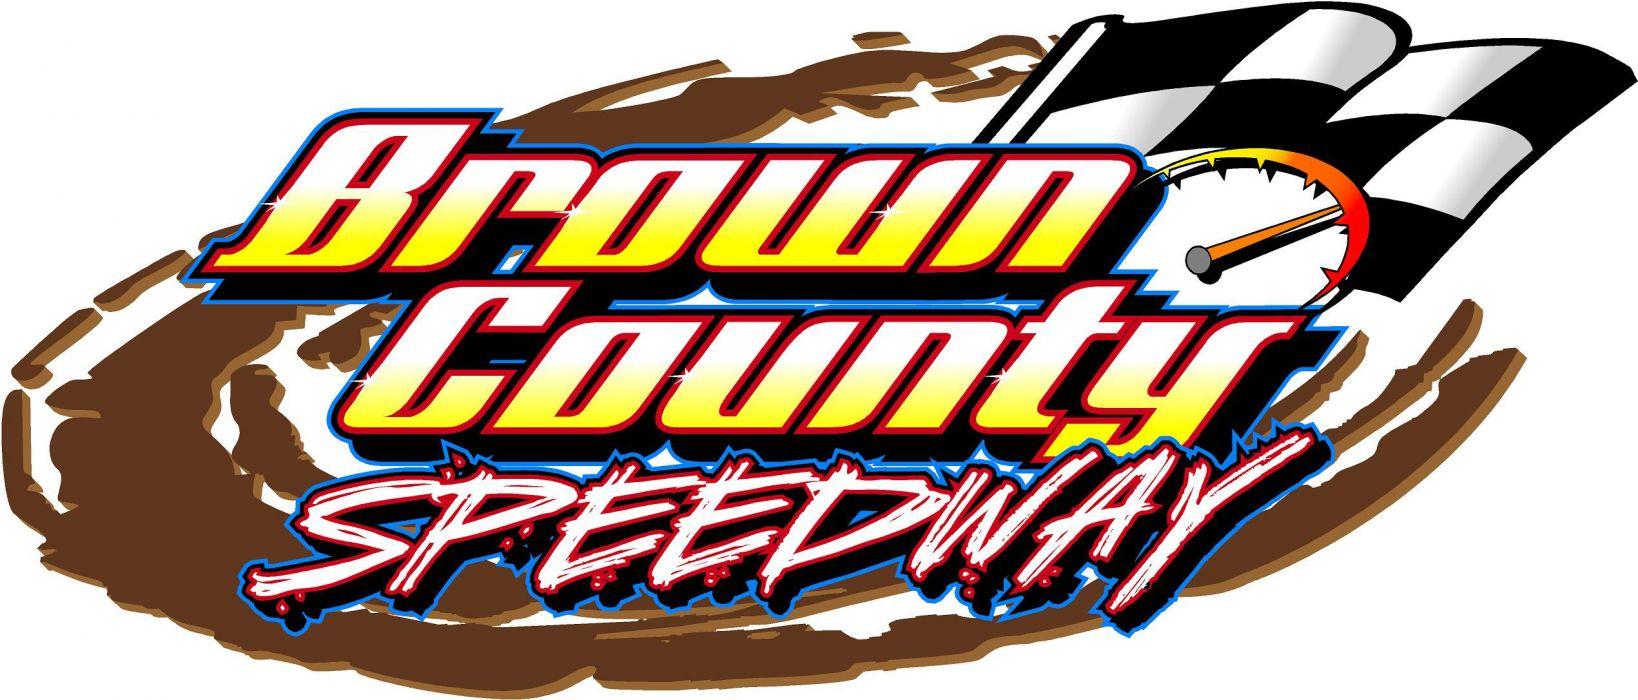 race racing logo         d wallpaper